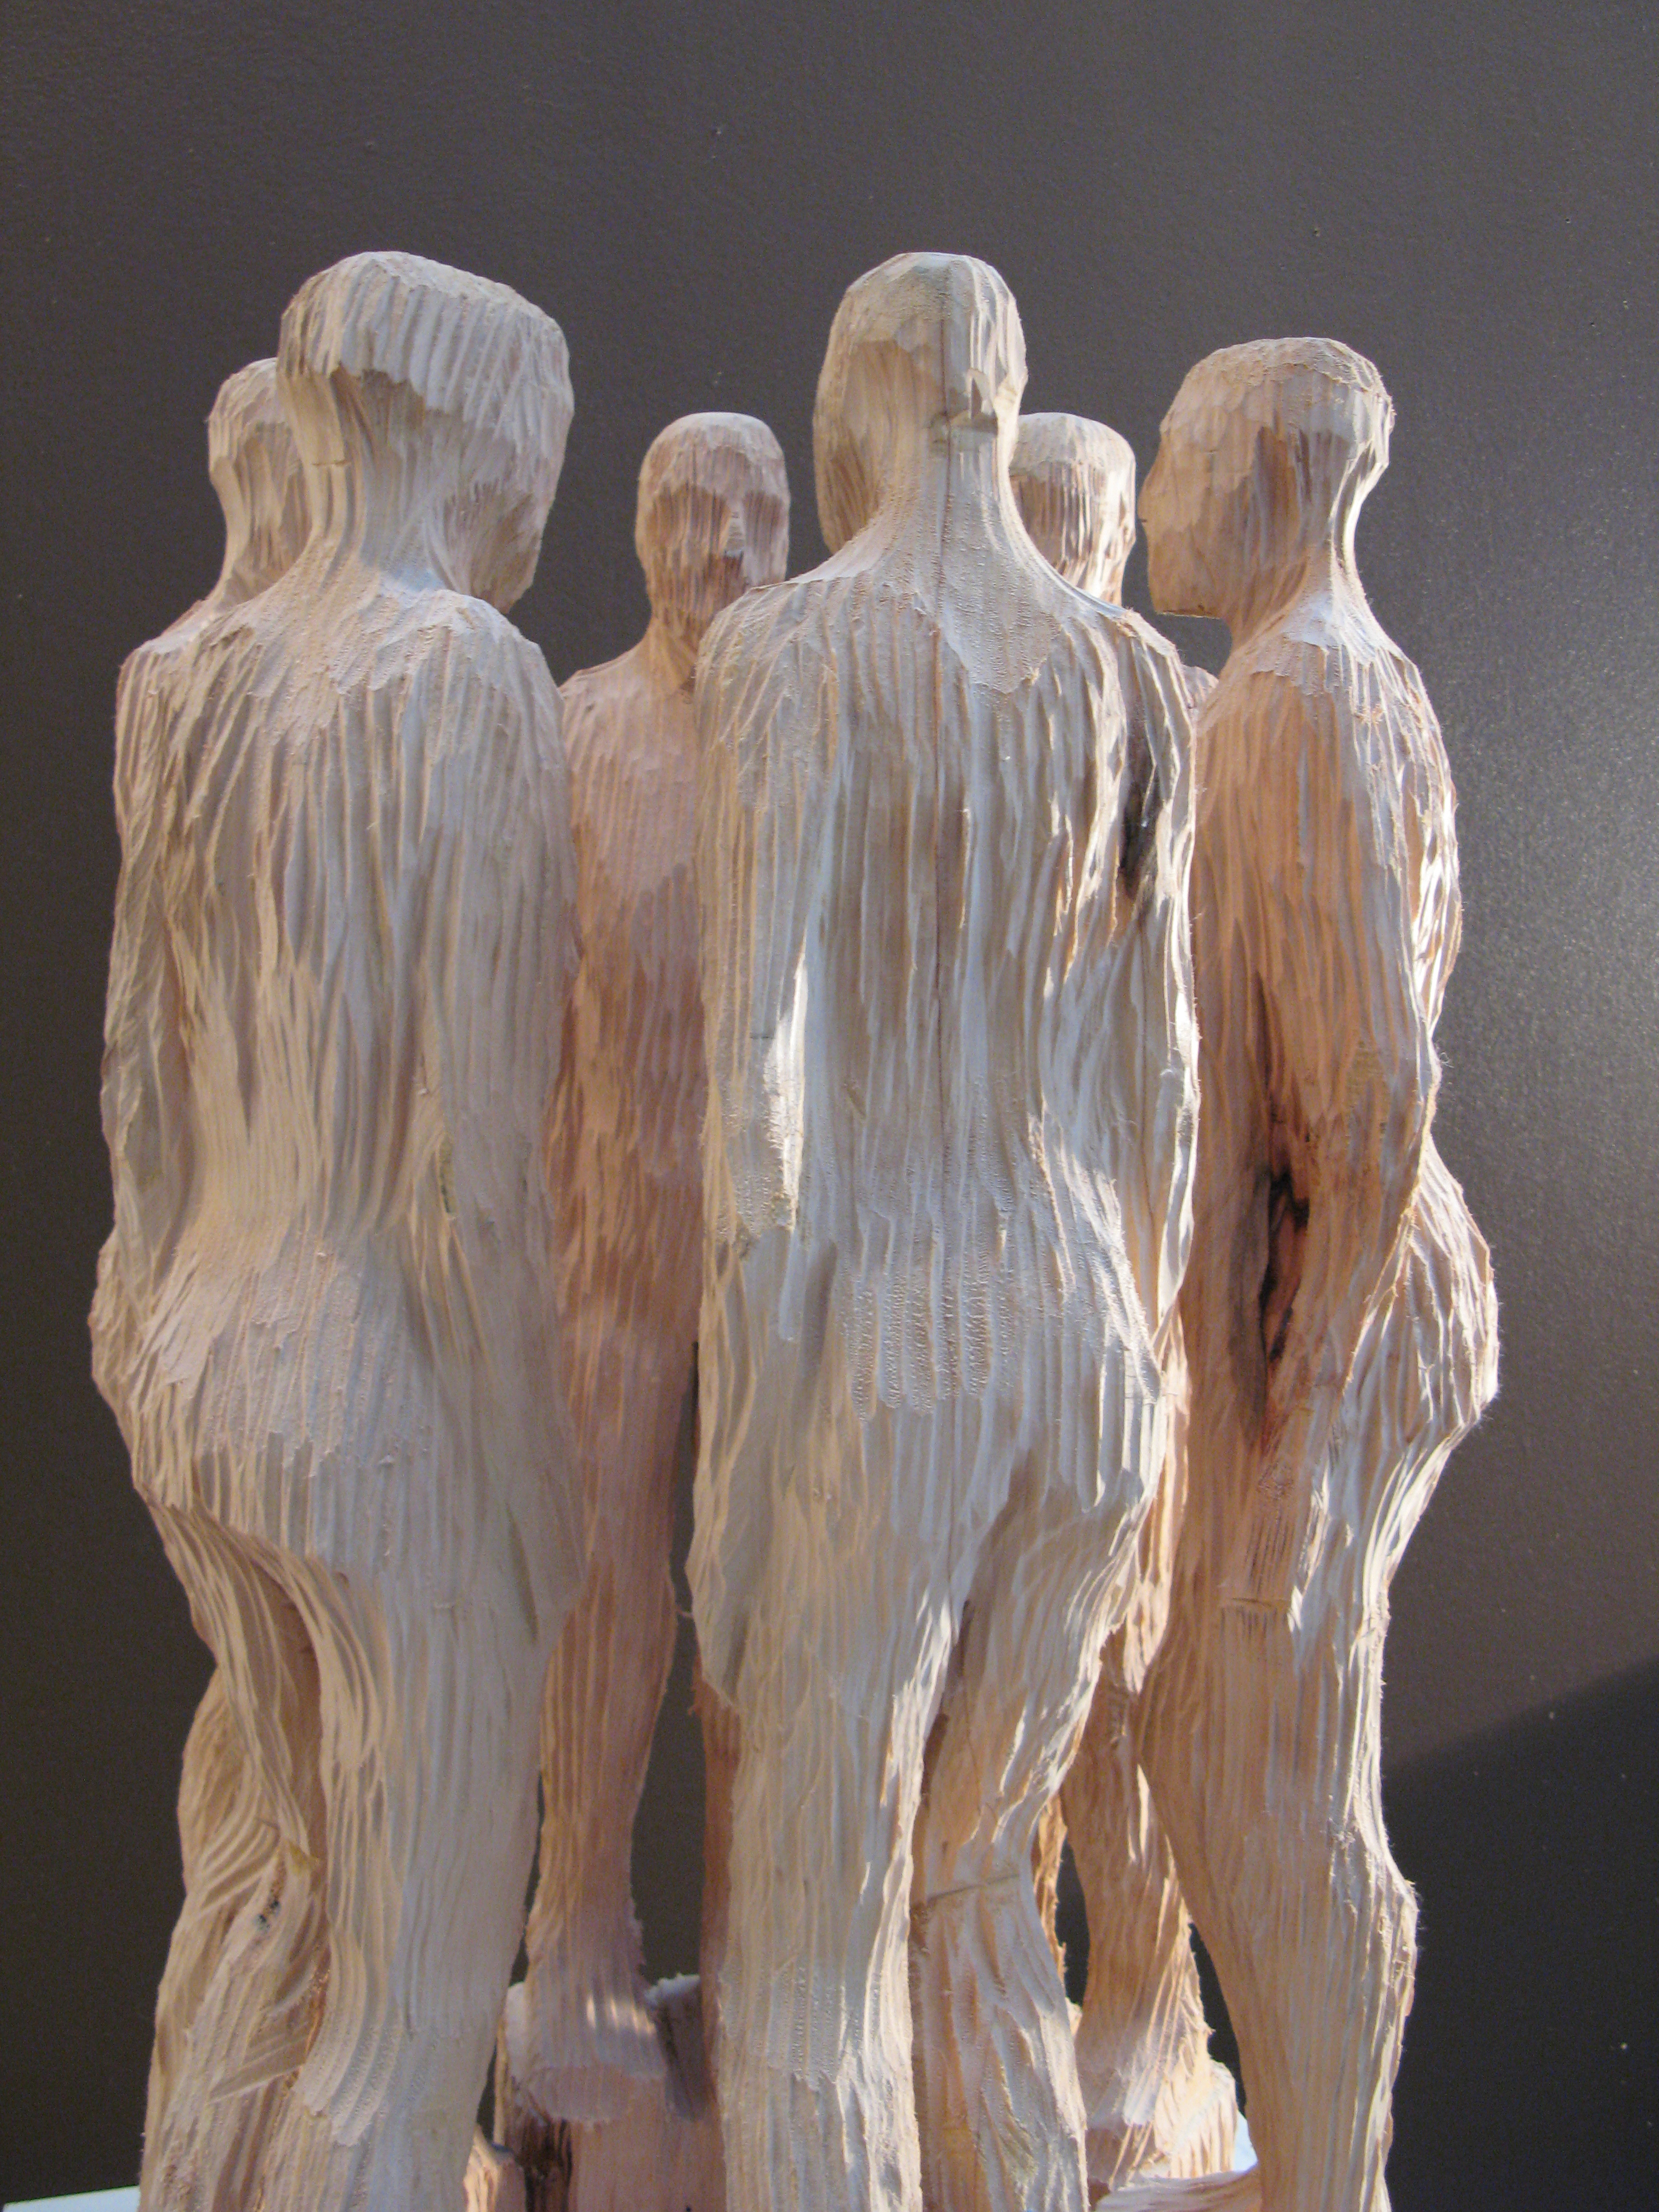 wooden attitudes 2